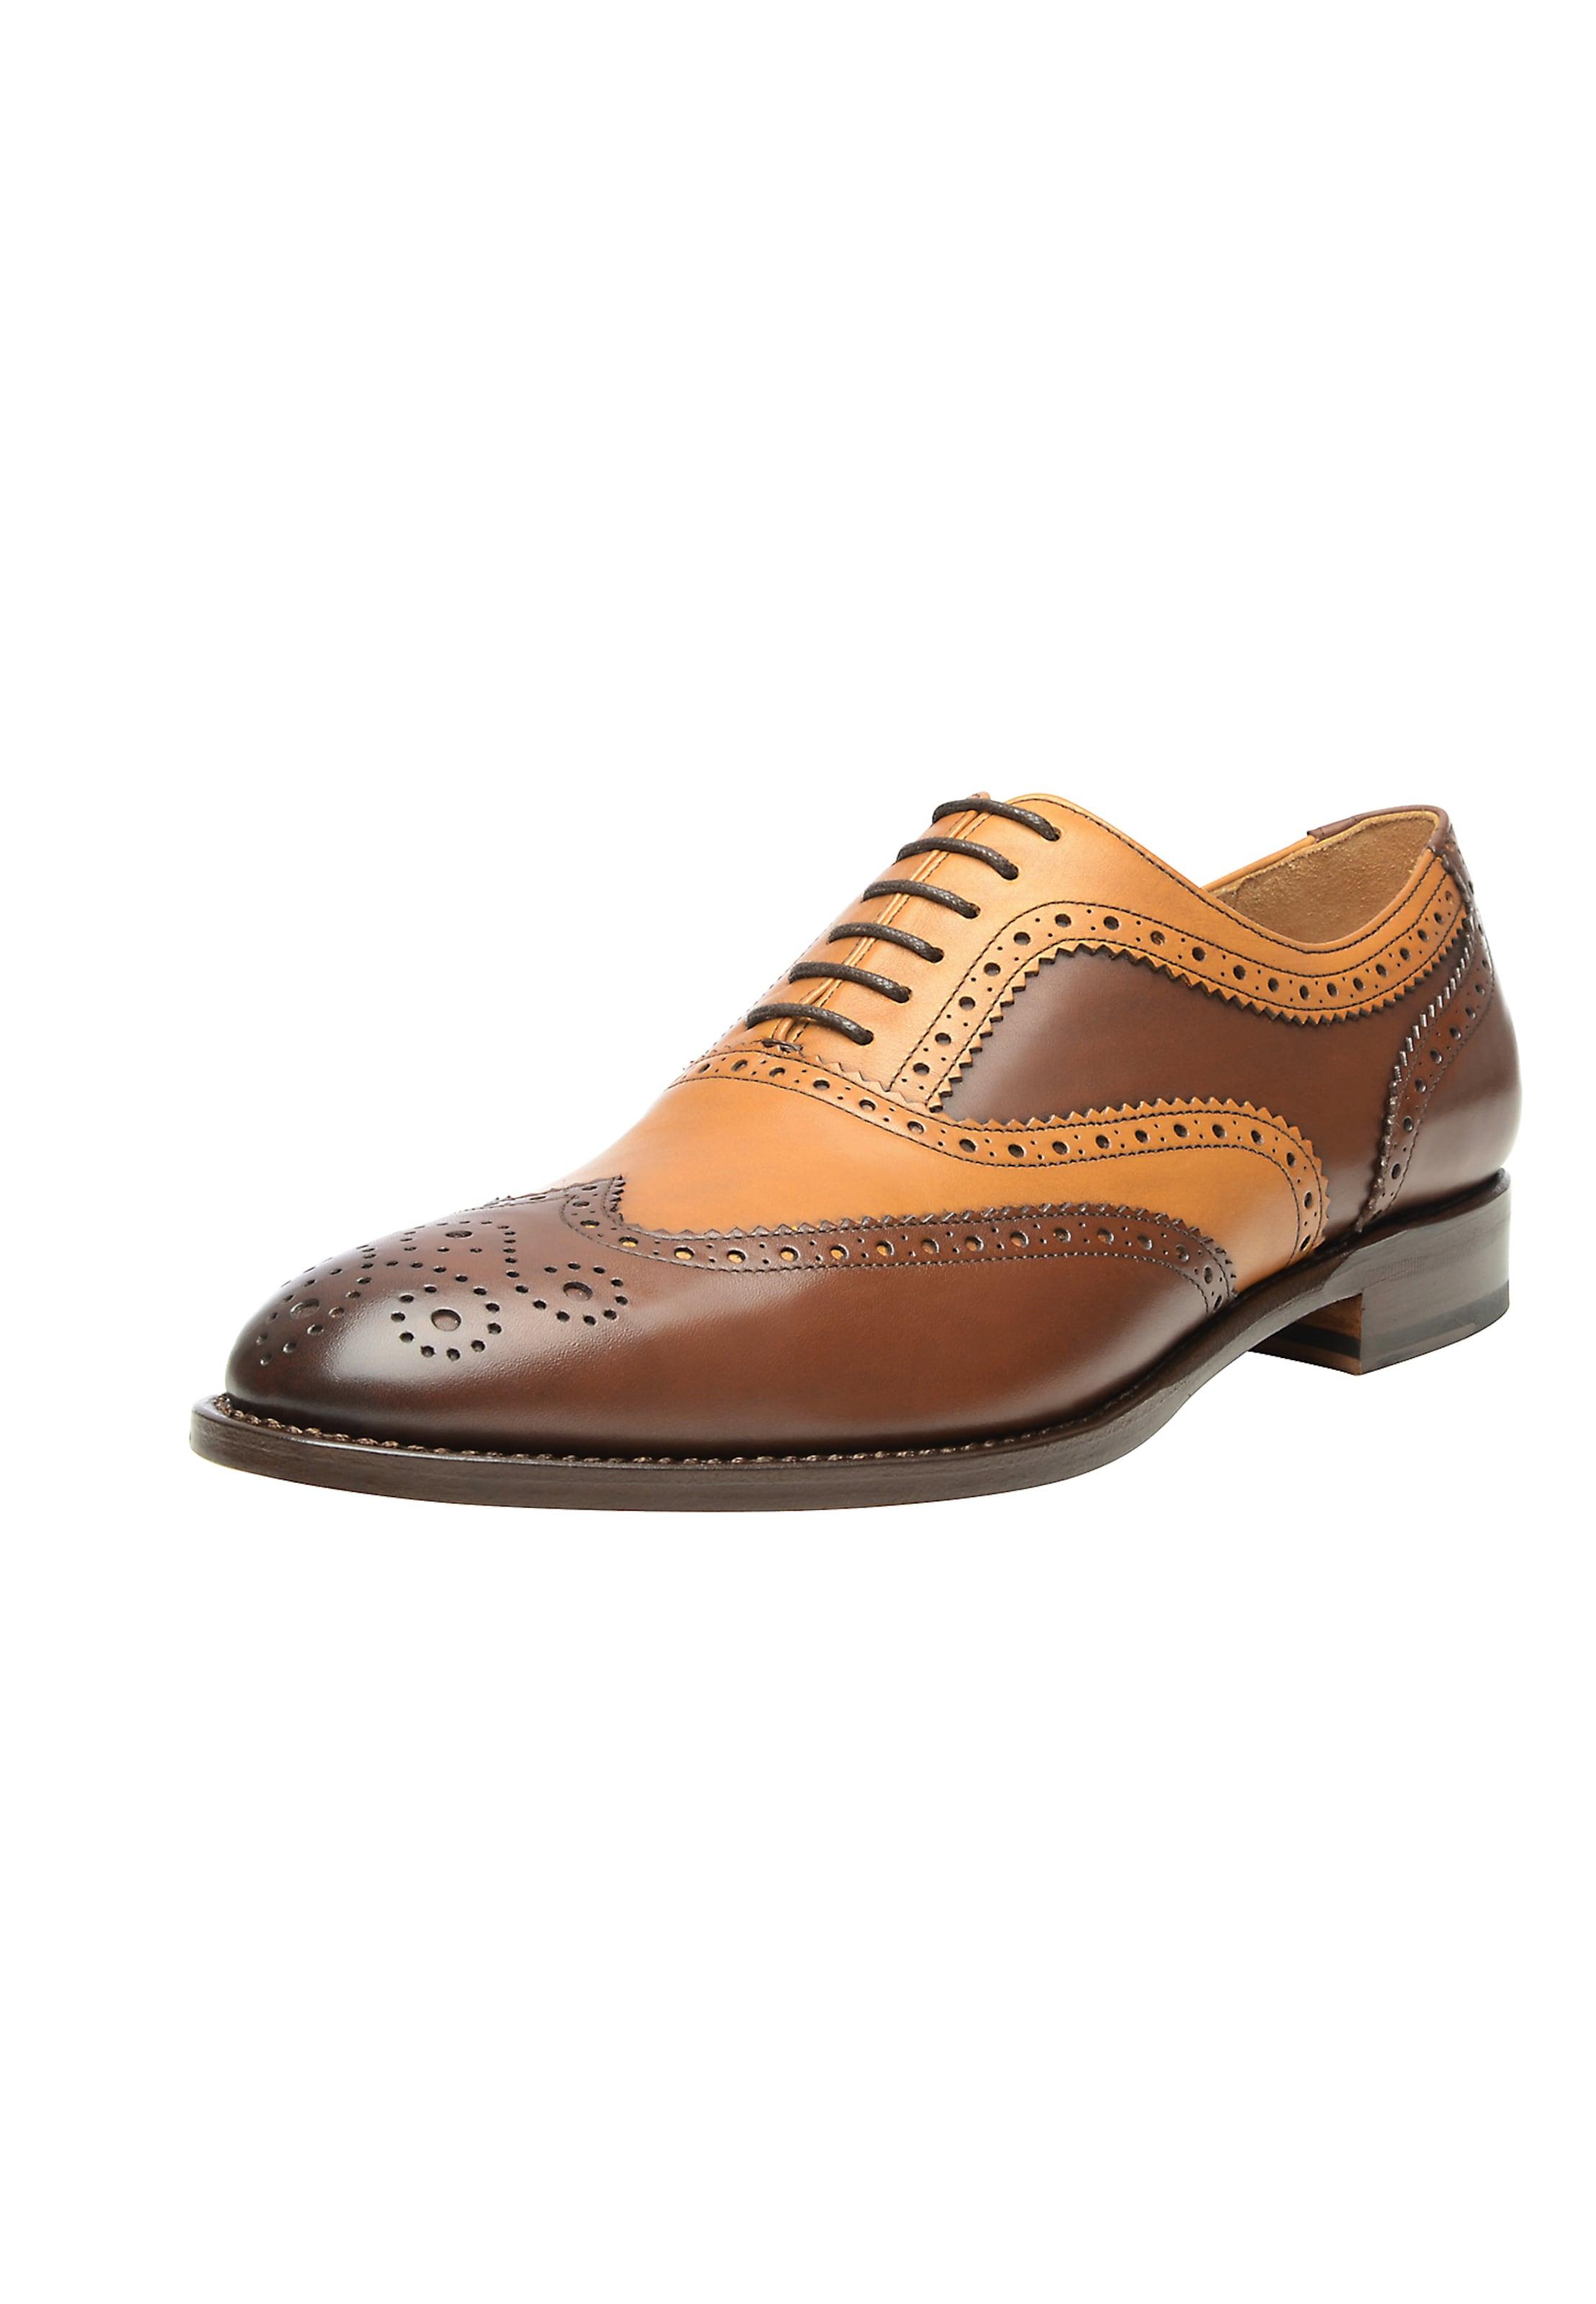 SHOEPASSION Halbschuhe No. 383 Verschleißfeste billige Schuhe